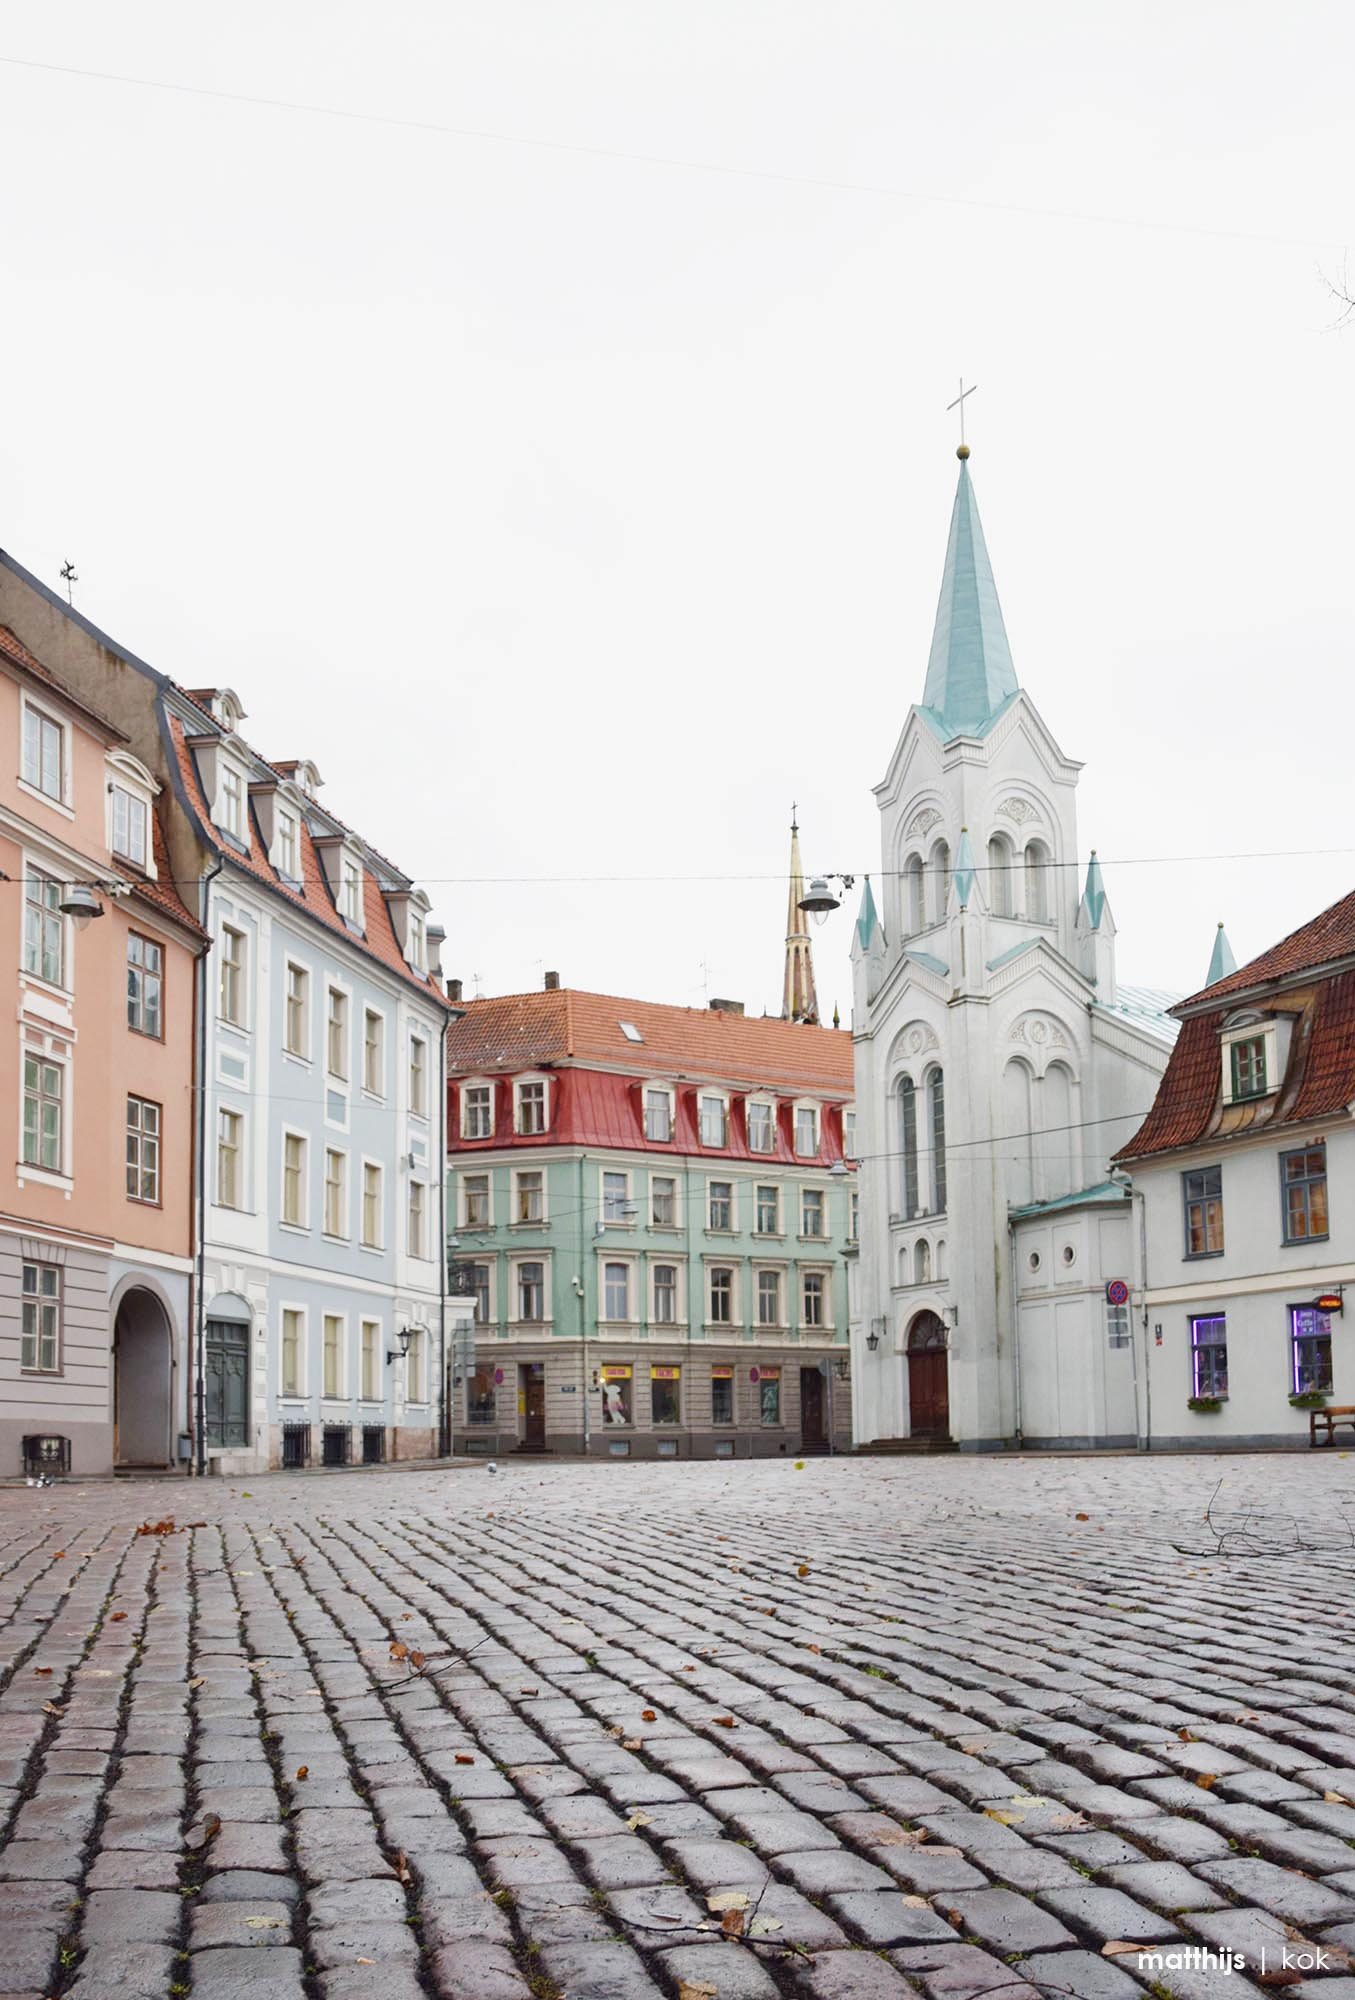 Pils Laukums, Riga, Latvia | Photo by Matthijs Kok